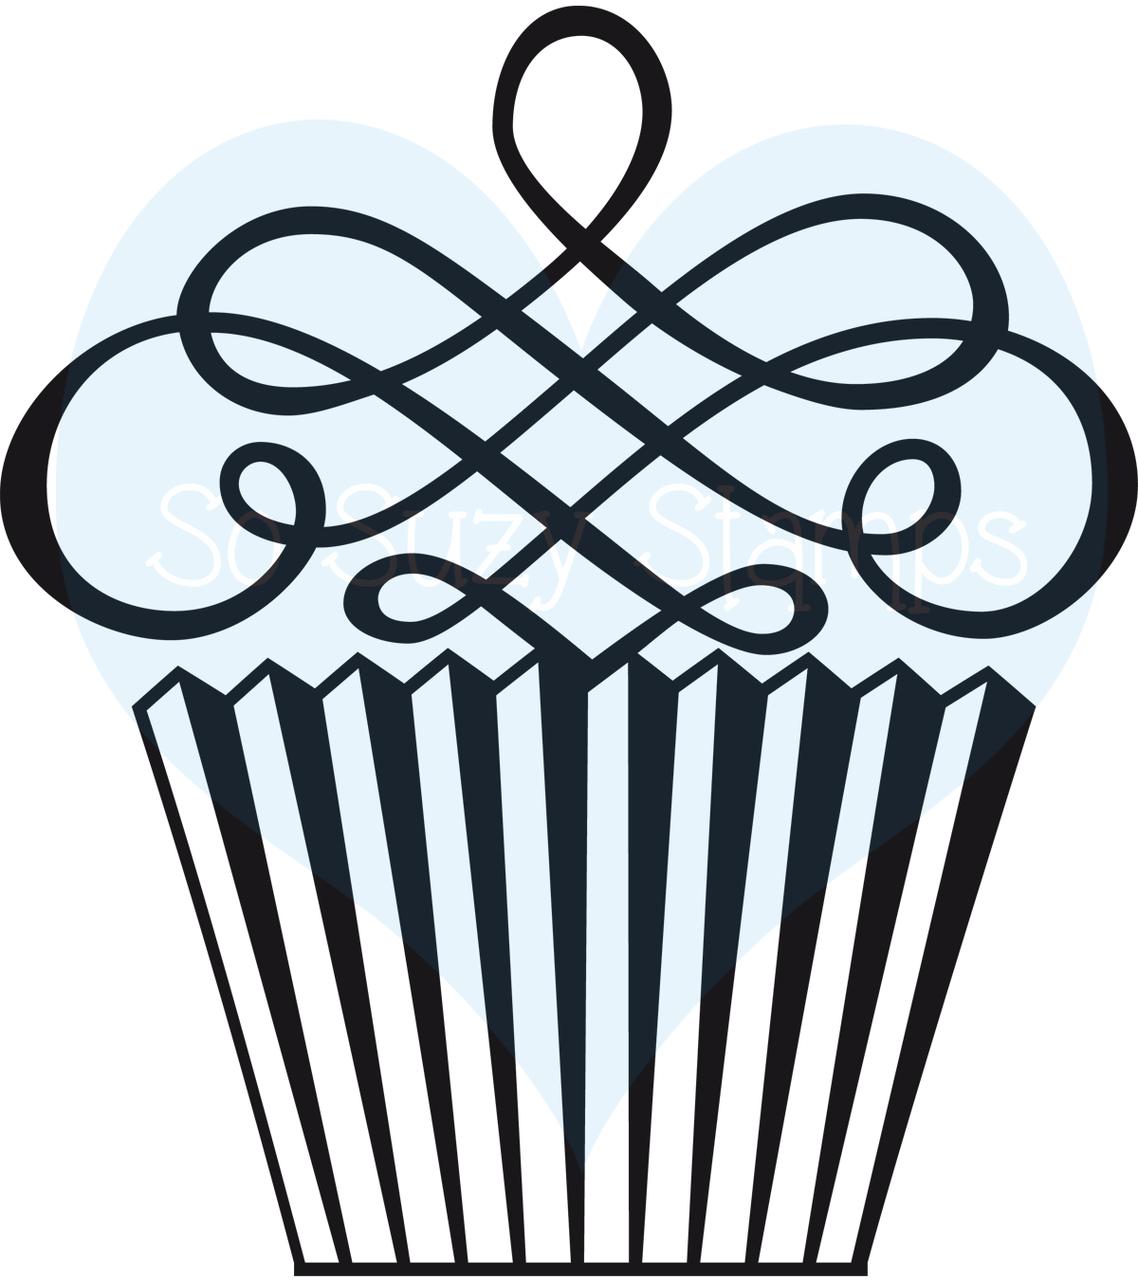 1138x1280 Cupcake Swirl Clipart Amp Cupcake Swirl Clip Art Images